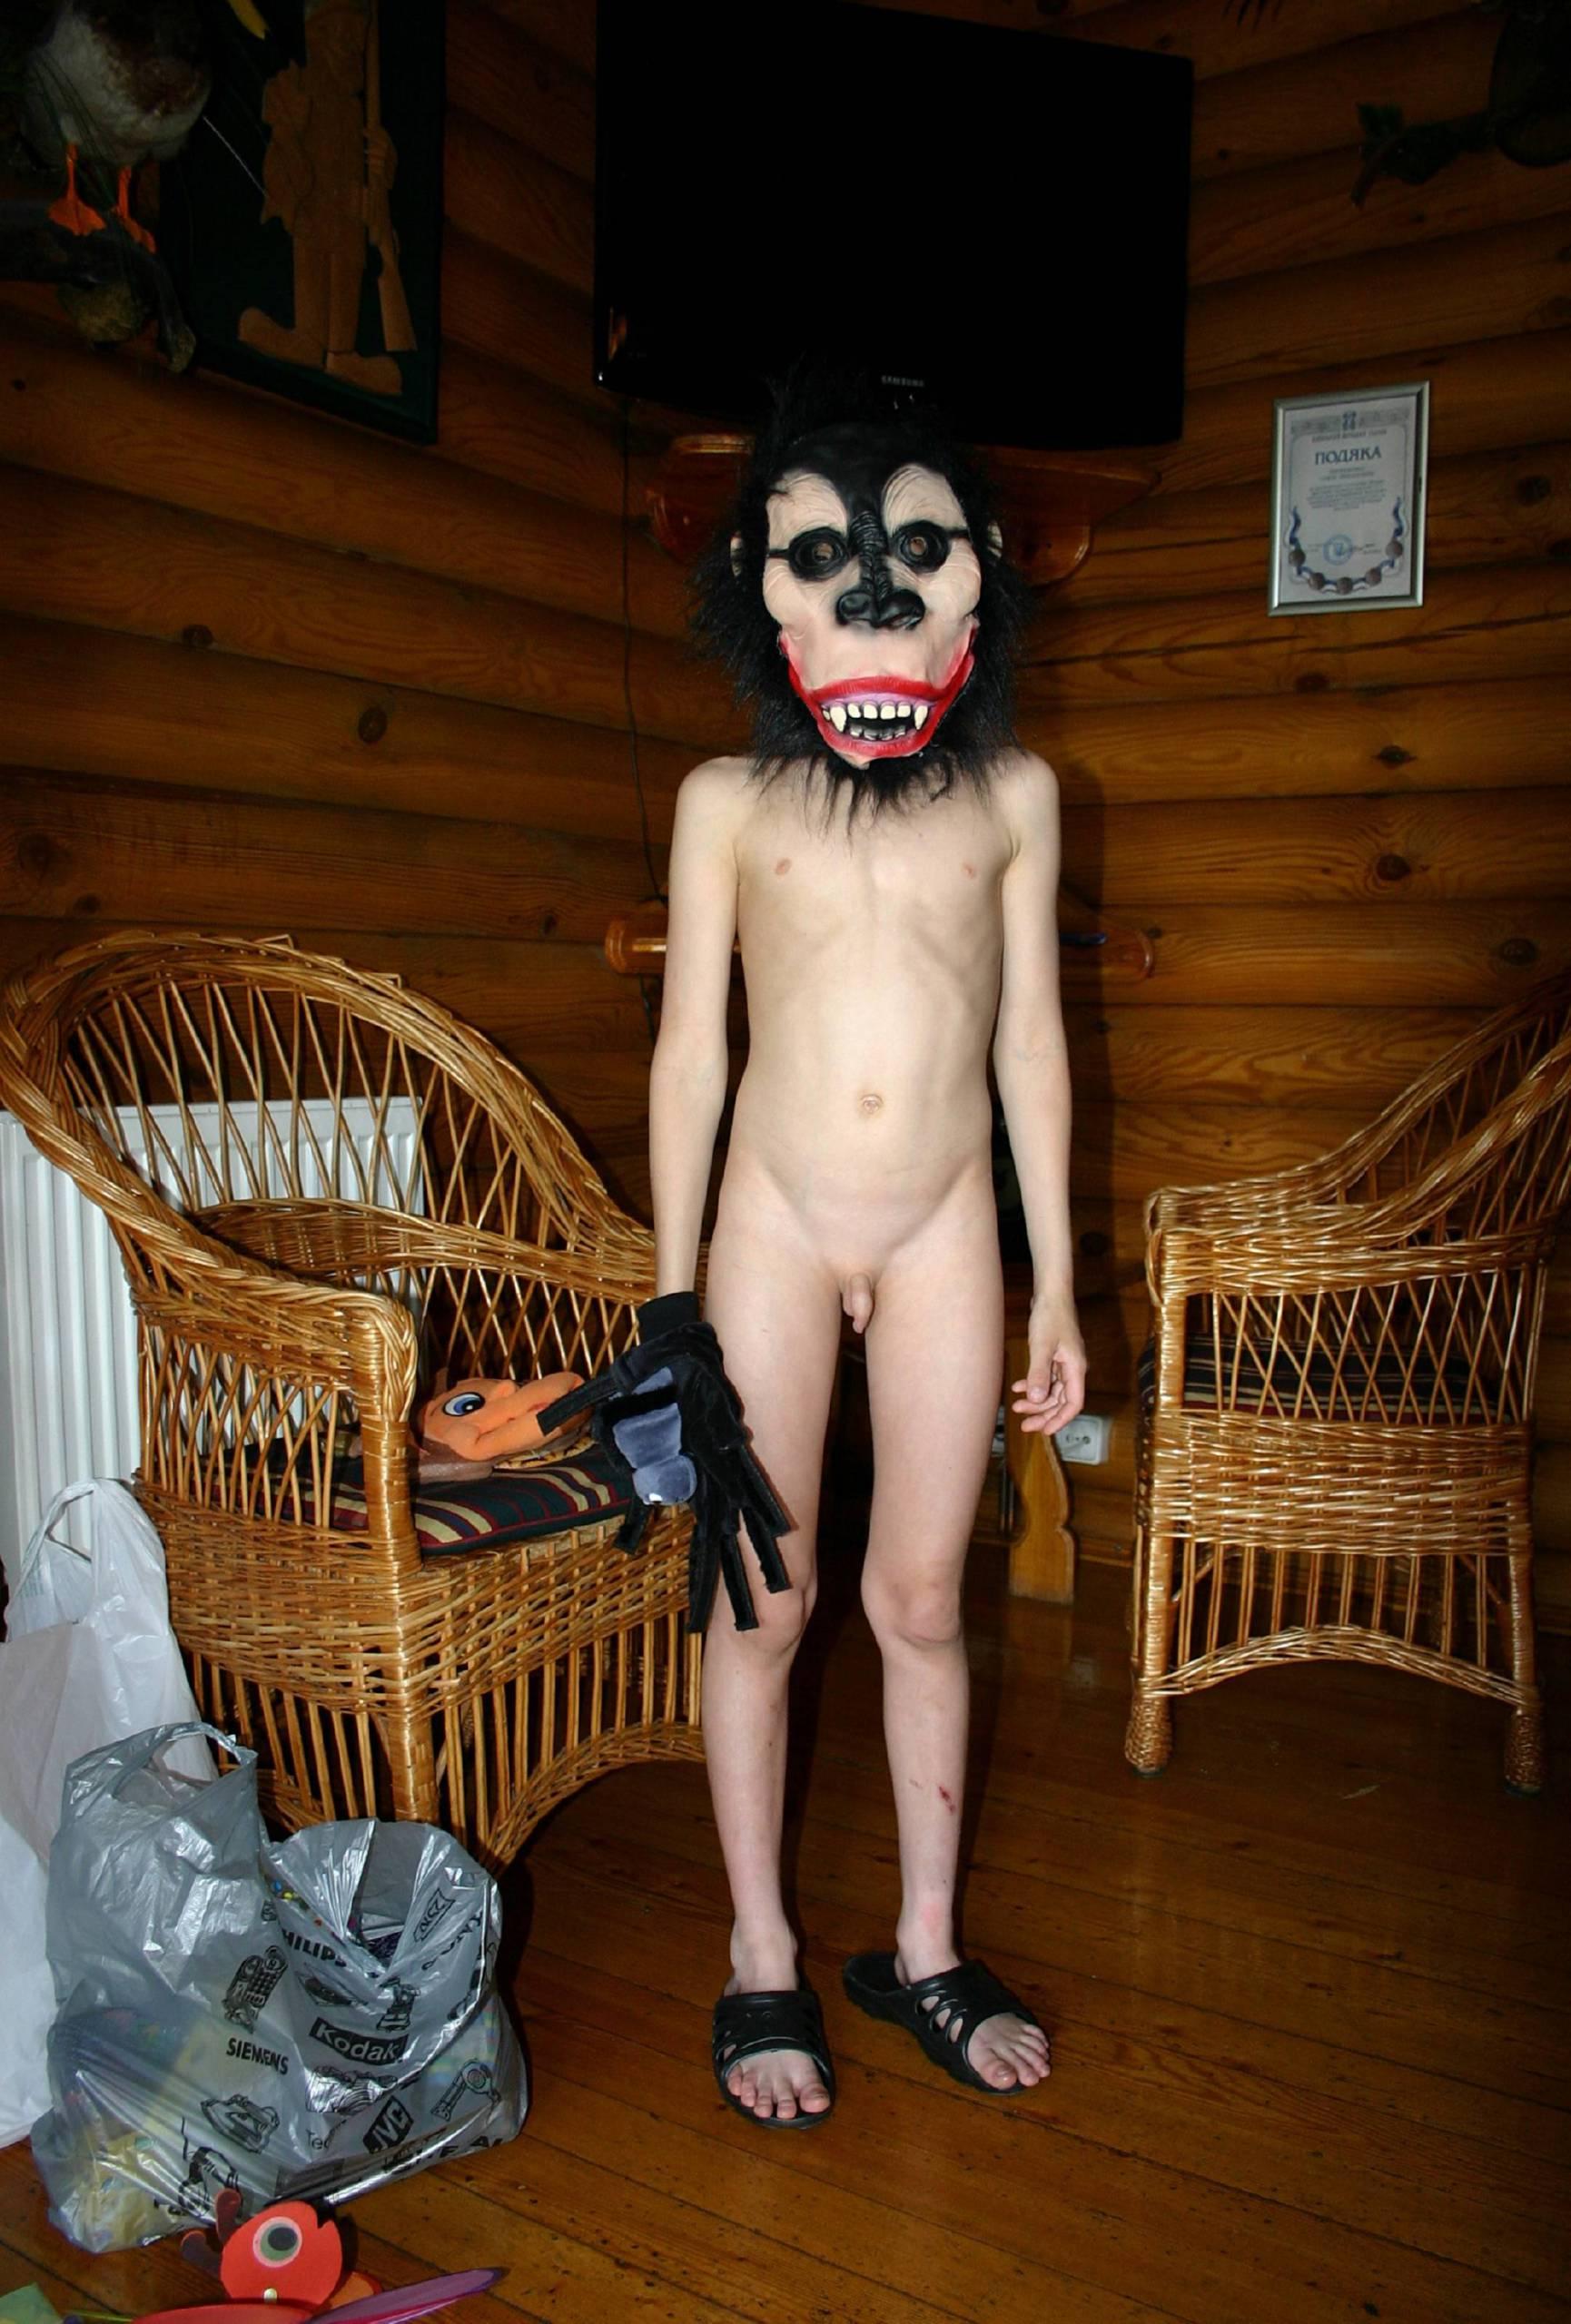 Nudist Pics Nude Girl Birthday Party - 2